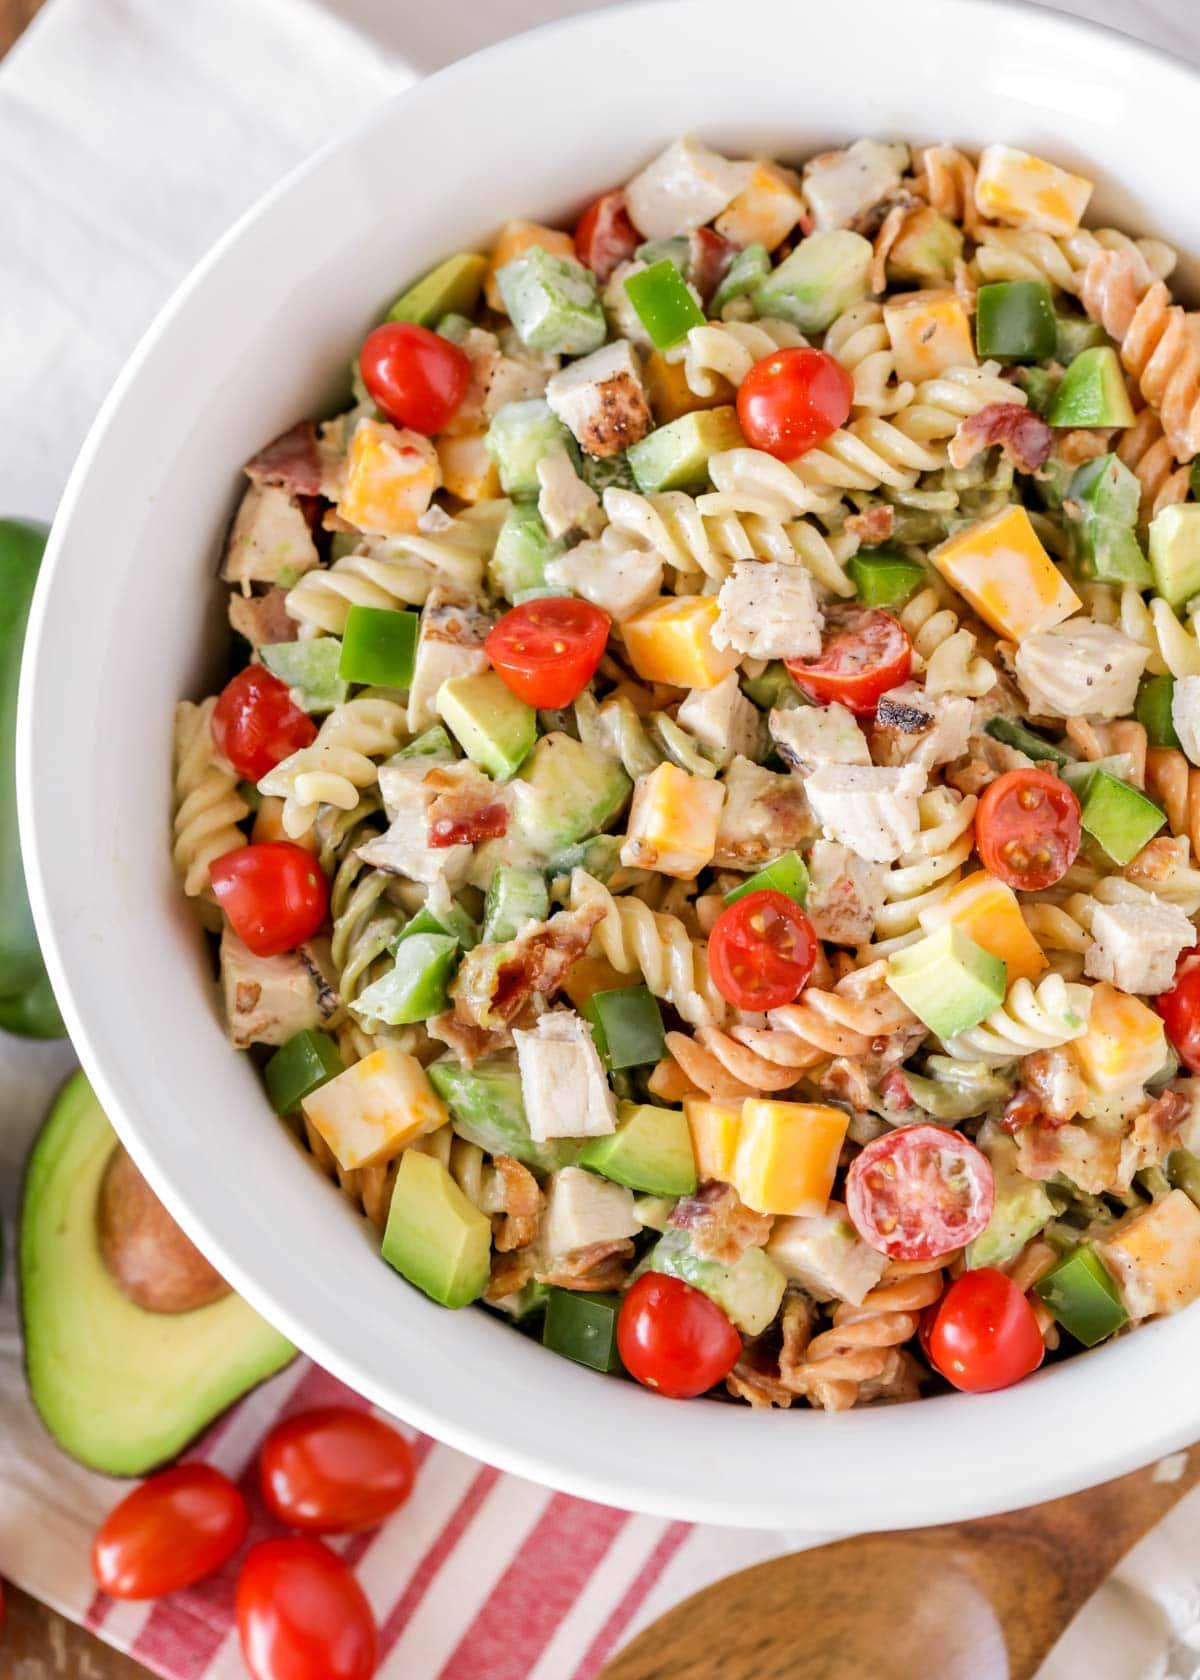 Chicken pasta salad recipe in a white bowl